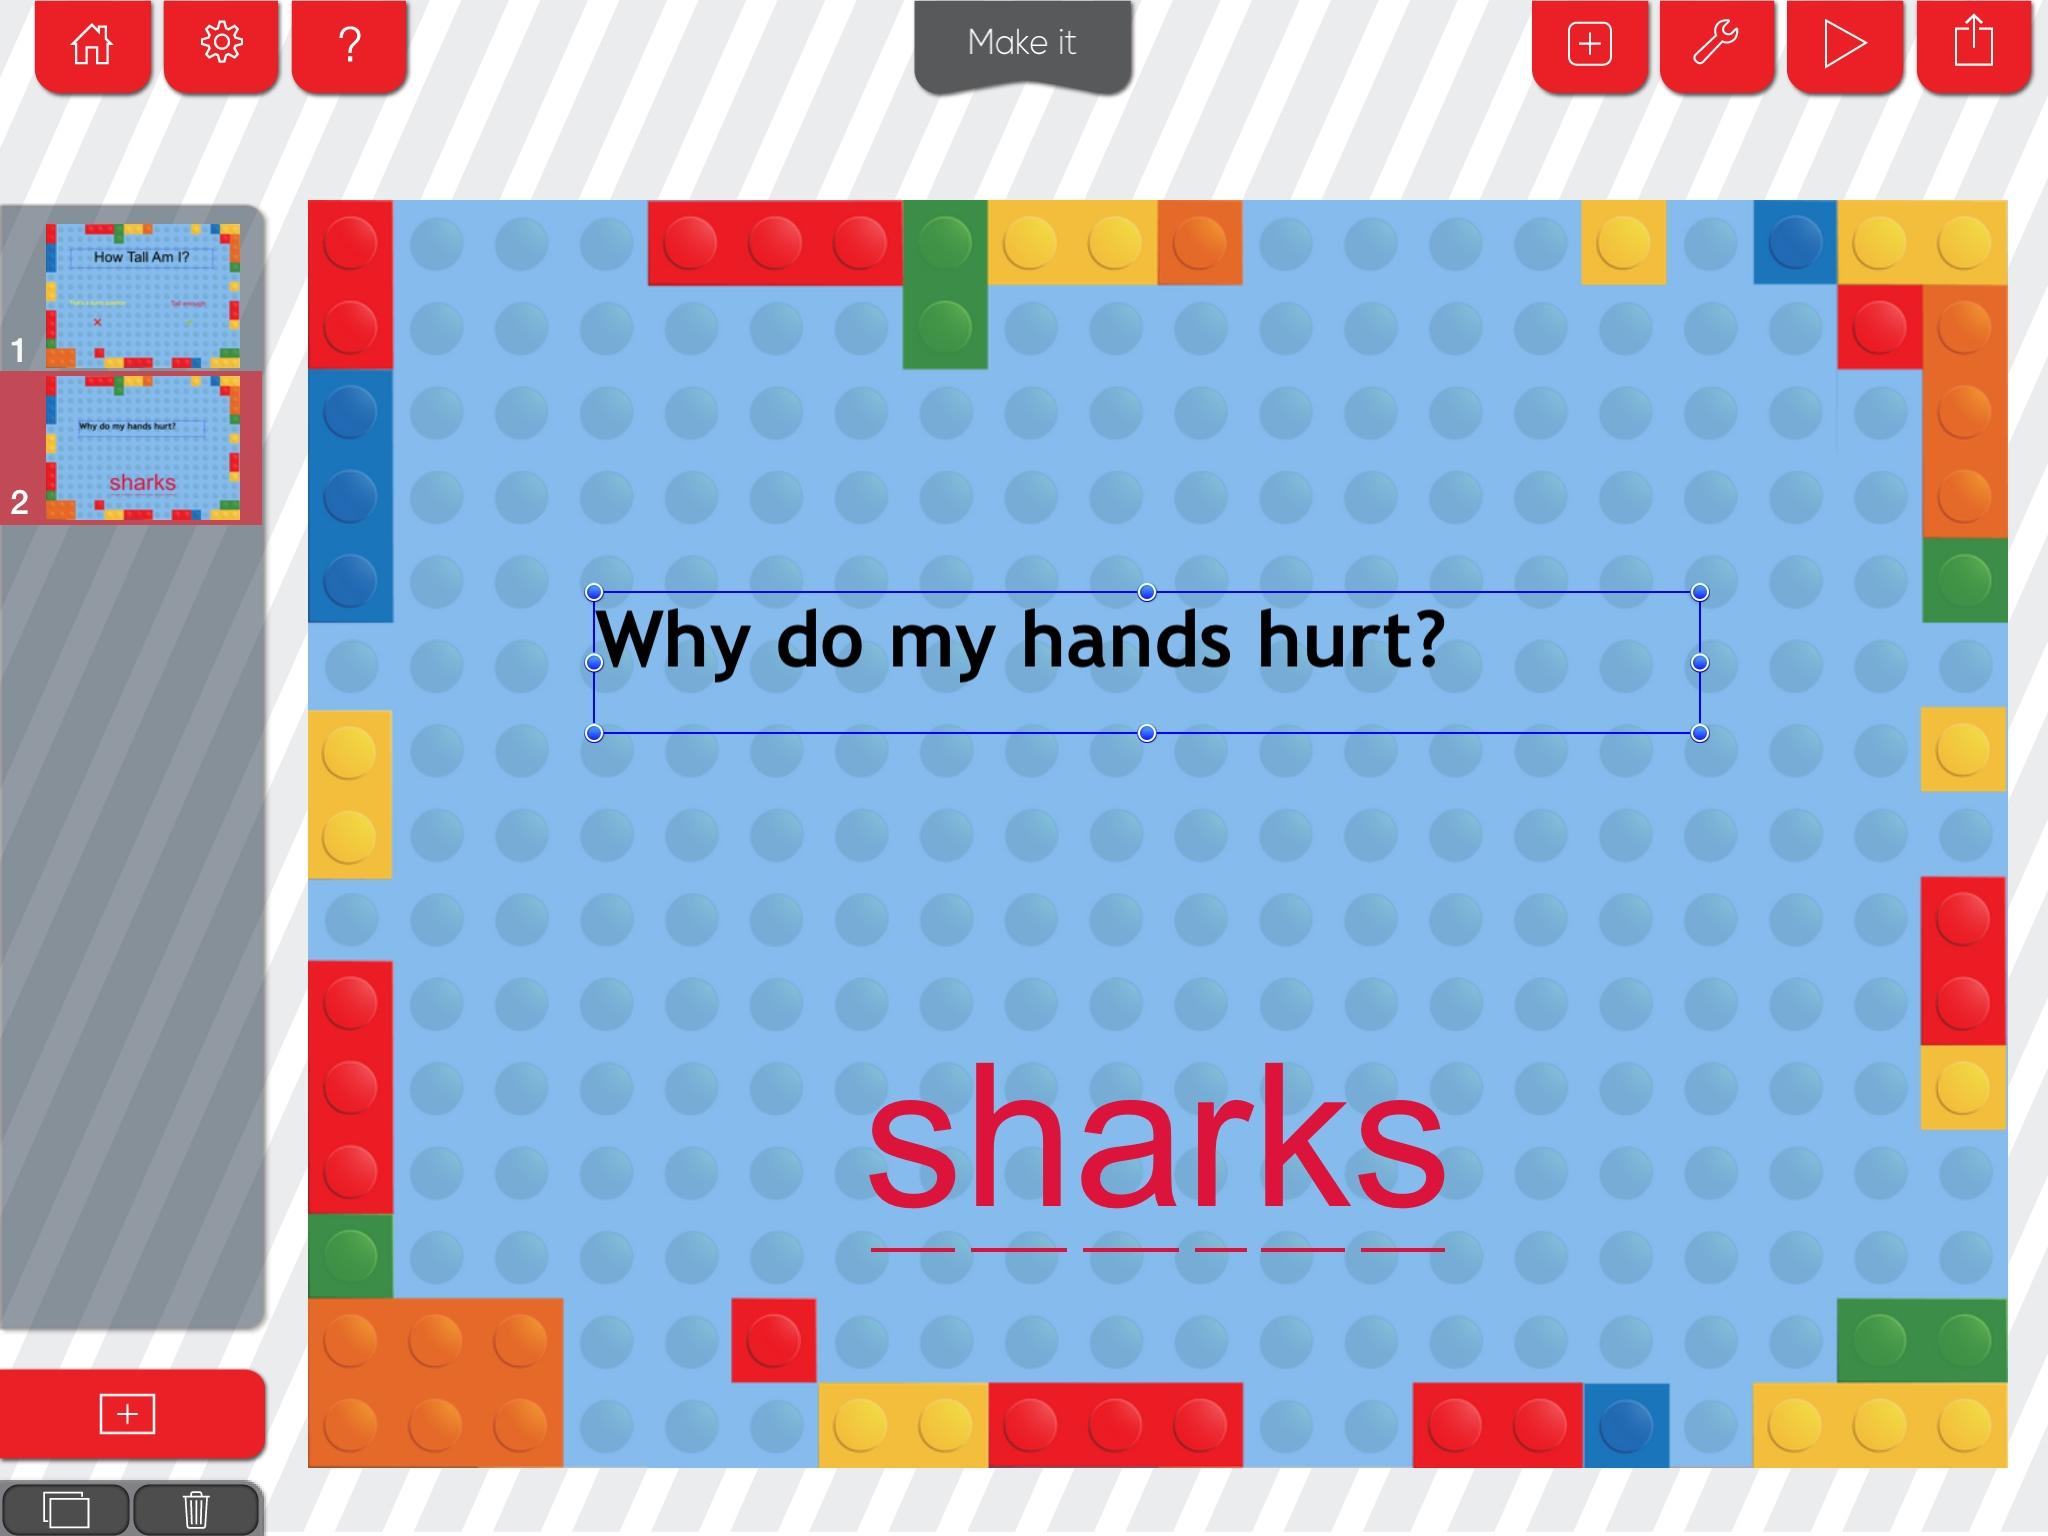 how to make a school app